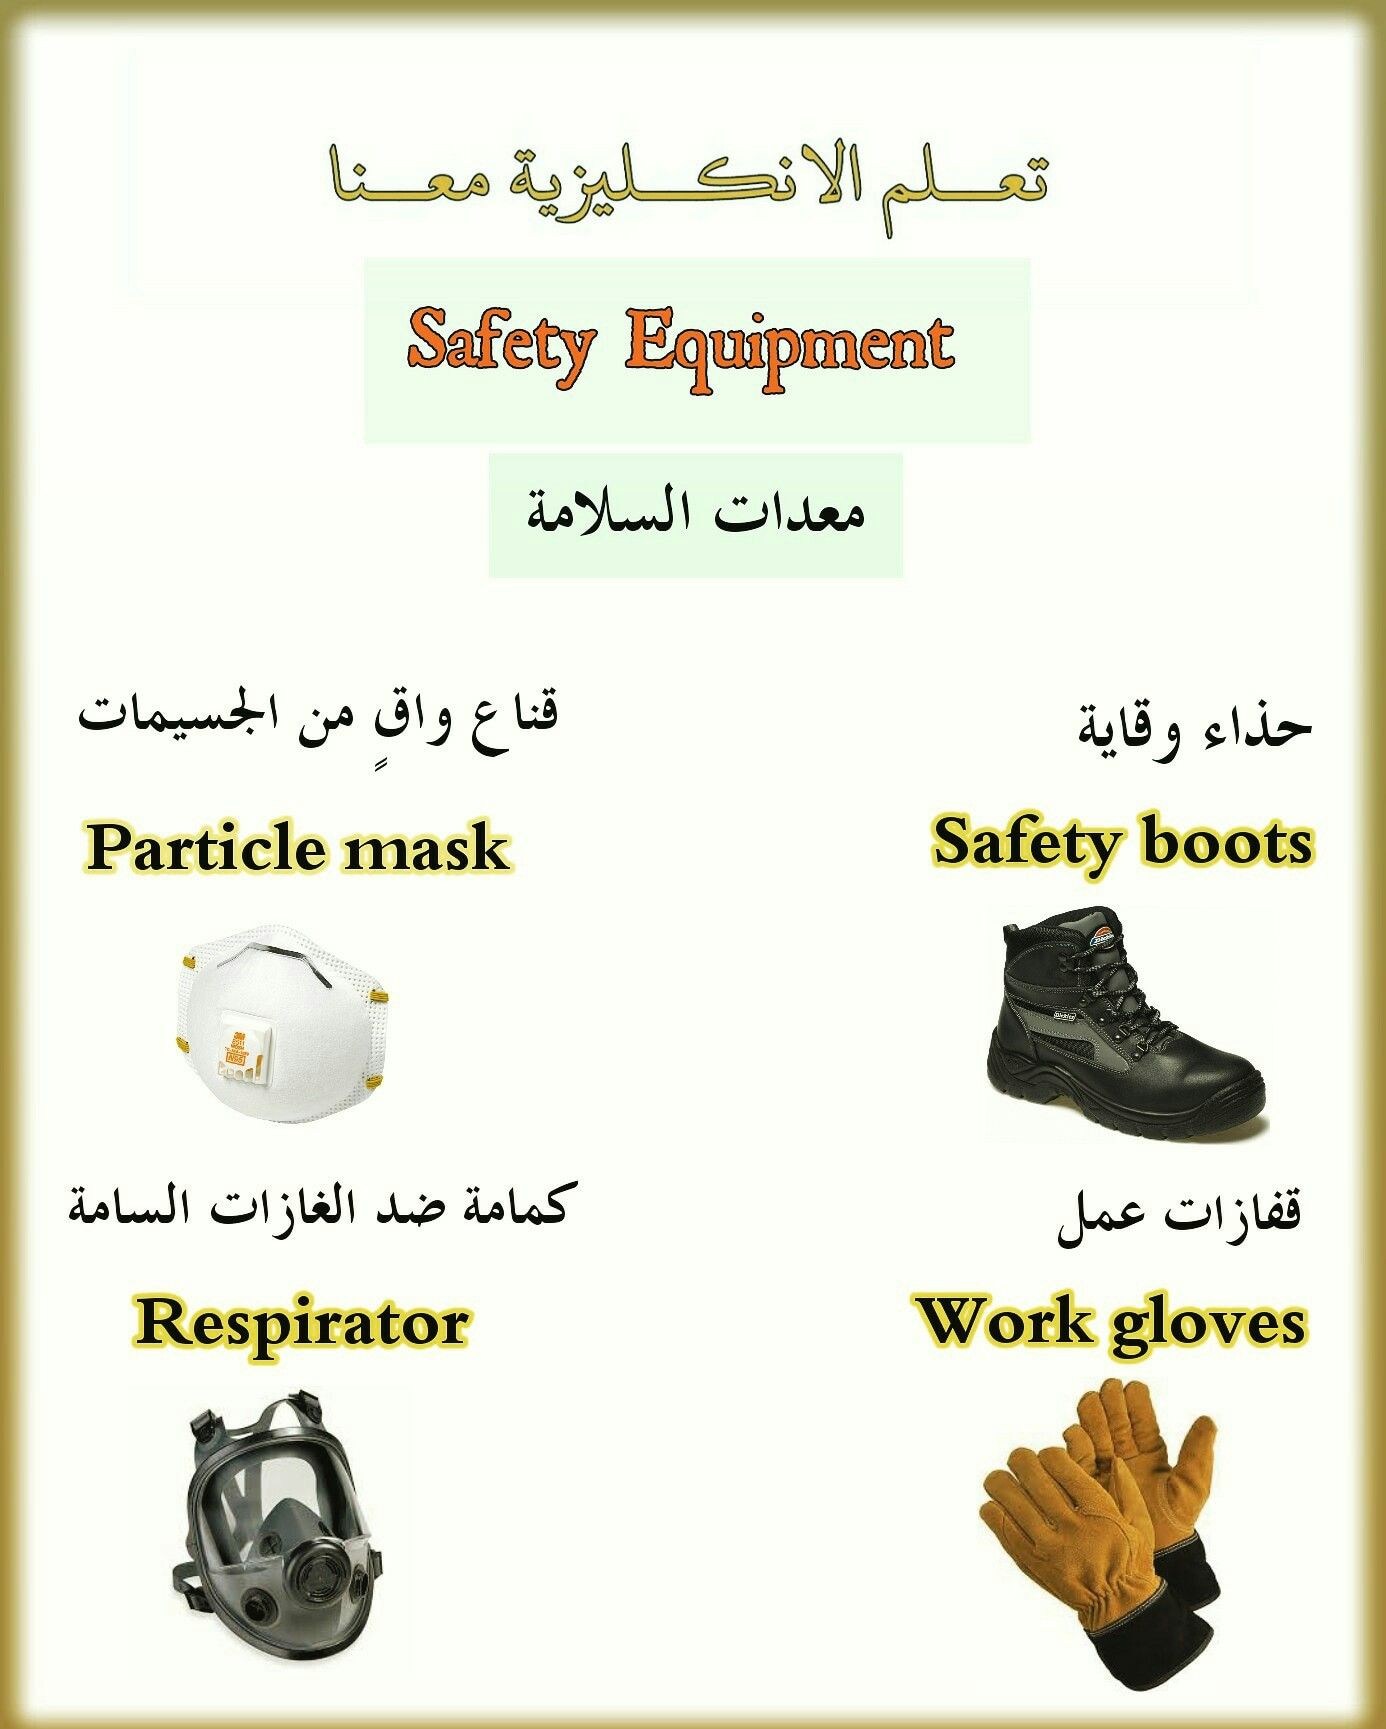 Safety Equipment معدات السلامة اعجبتك شارك لتعم الفائدة Kenan